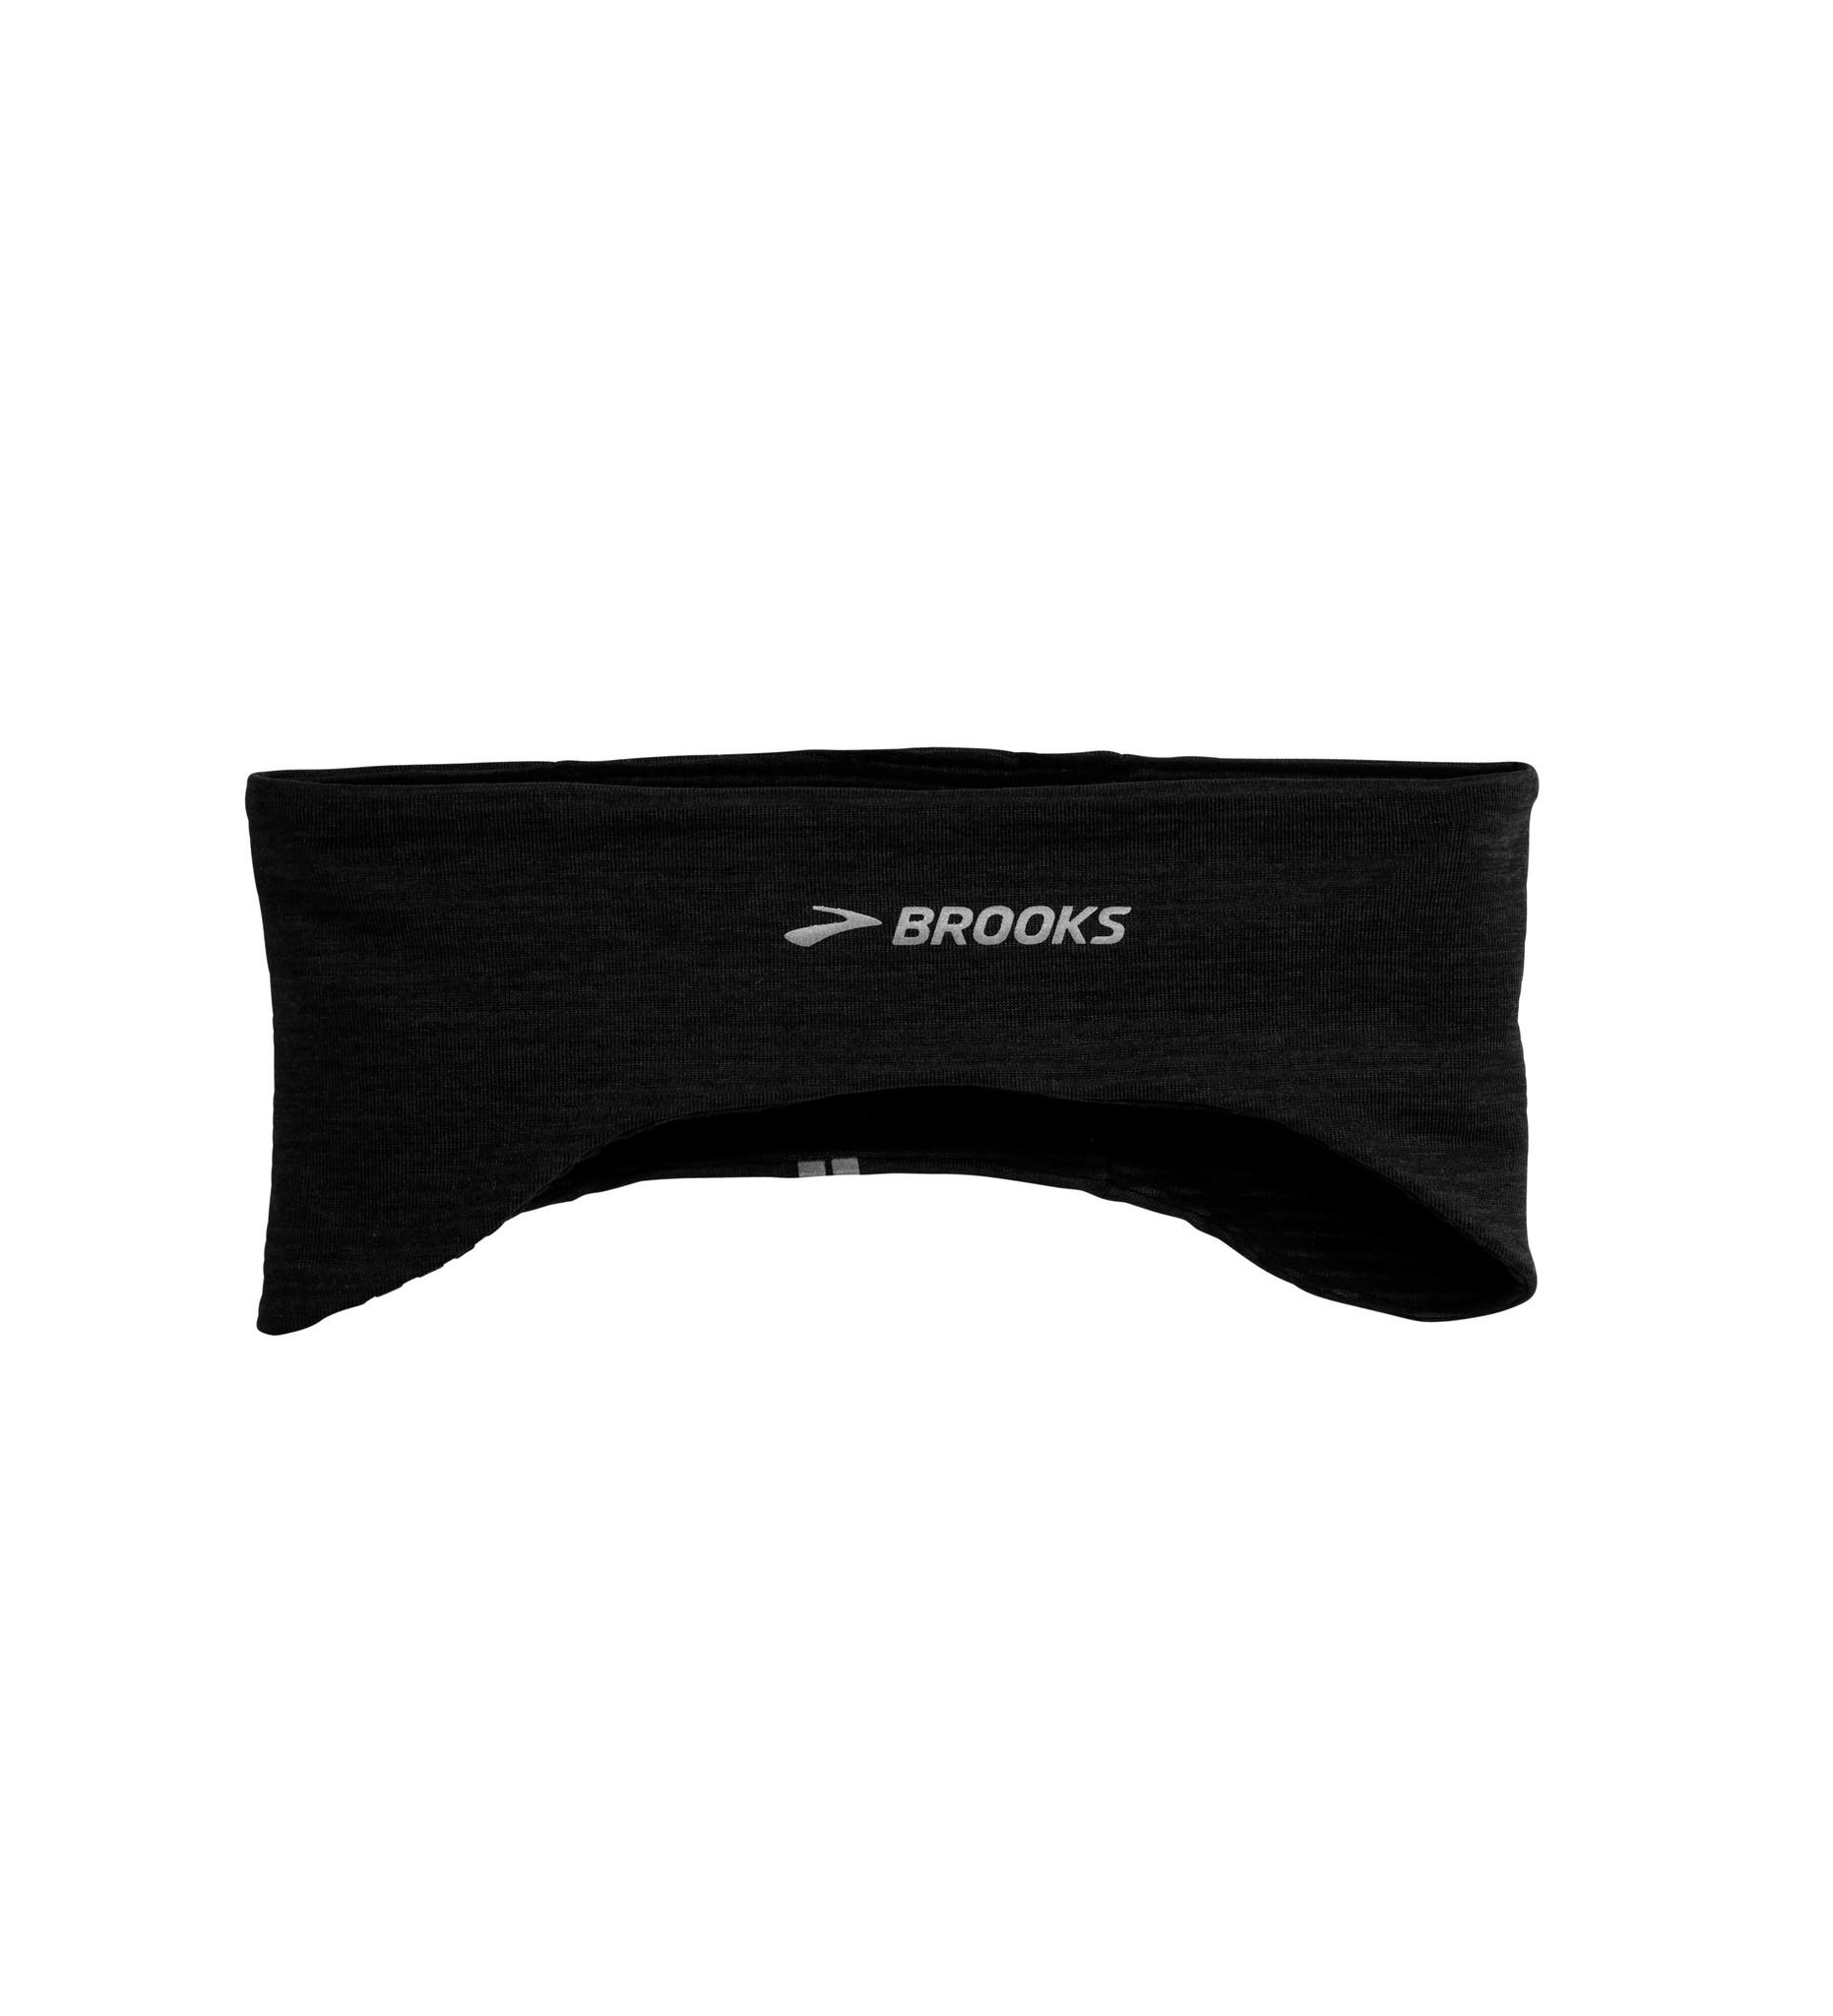 Brooks Notch Thermal Headband